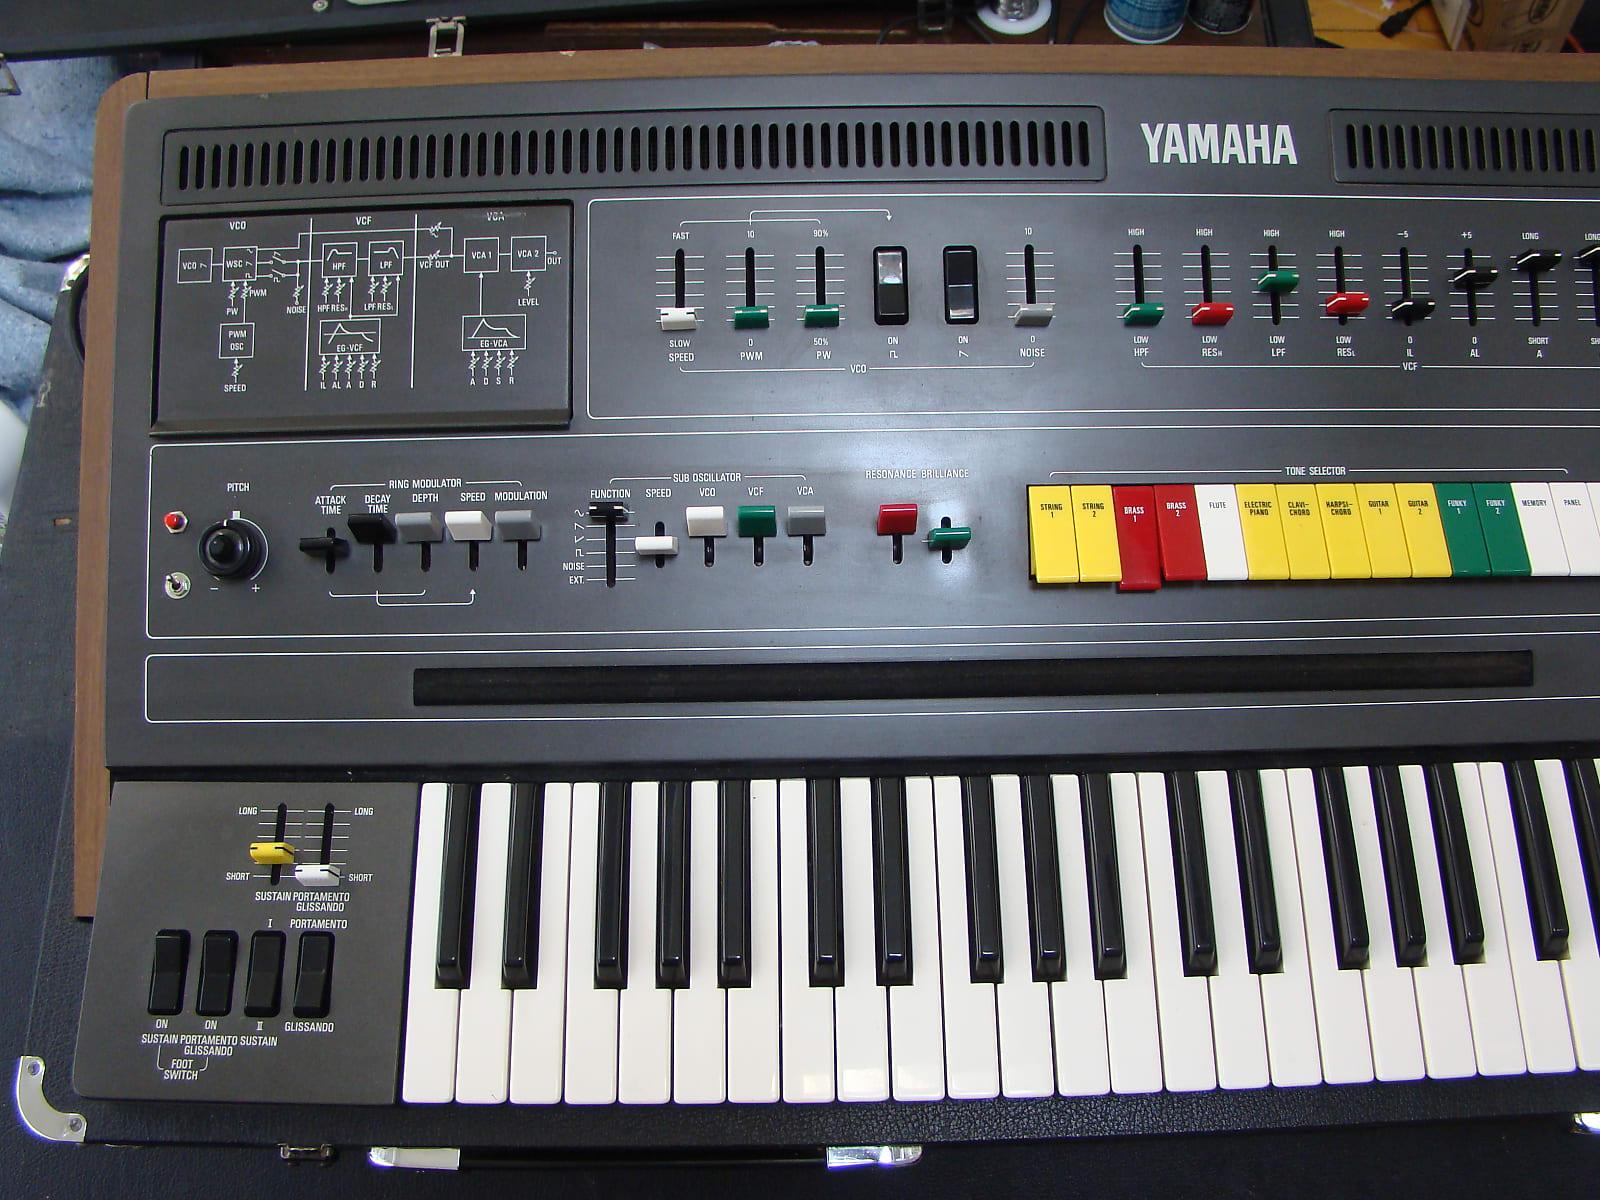 Yamaha CS-60 with MIDI